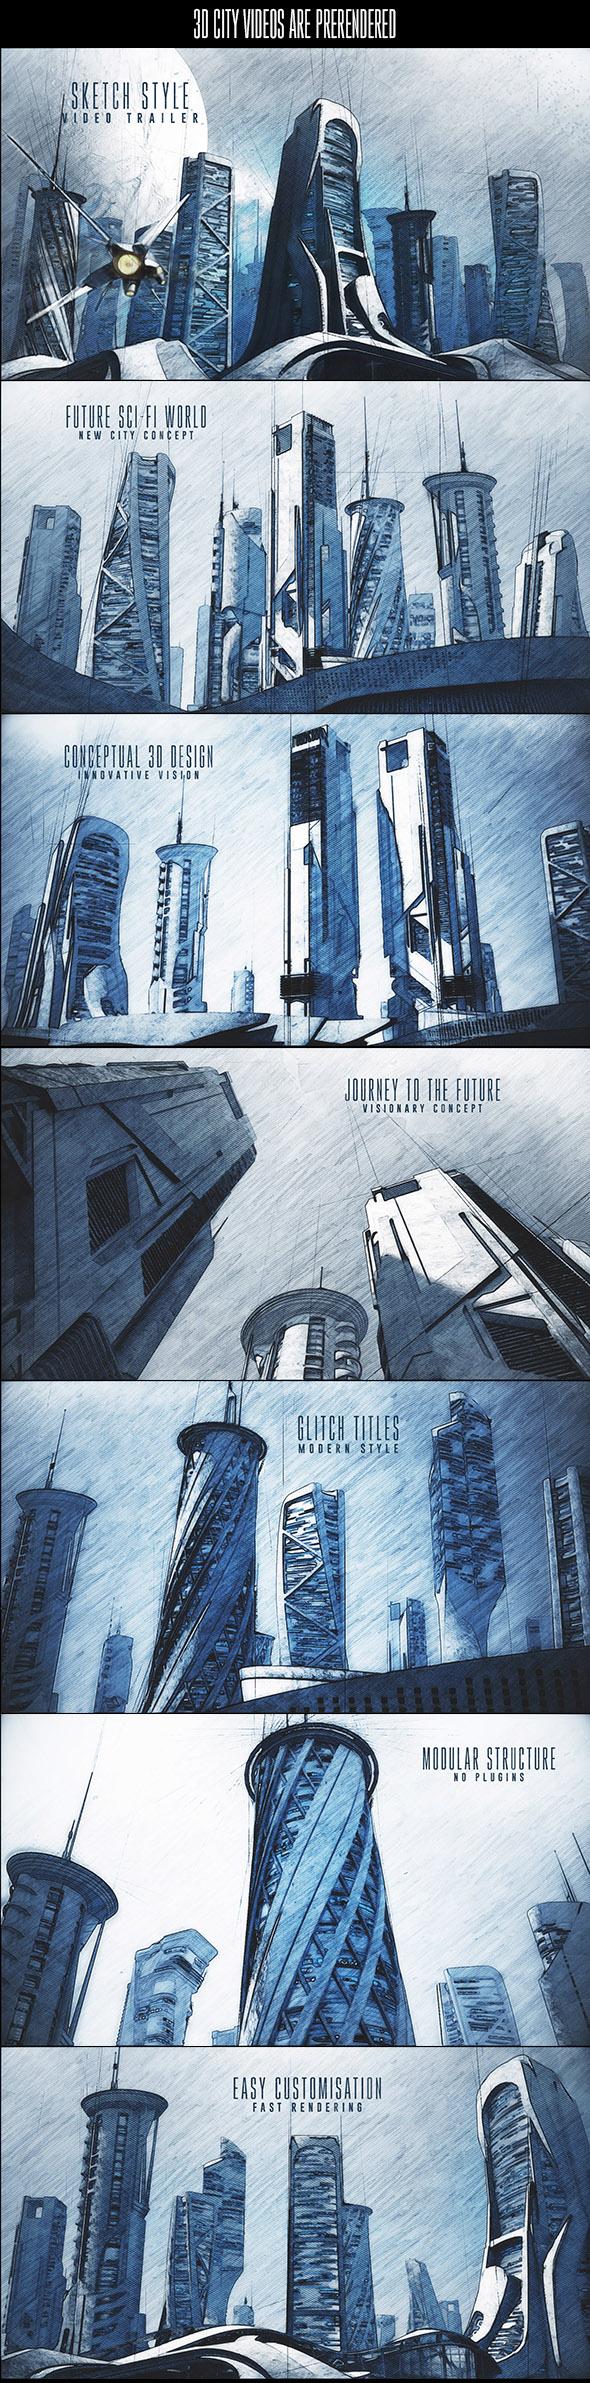 Architectural Sketch Trailer - 1